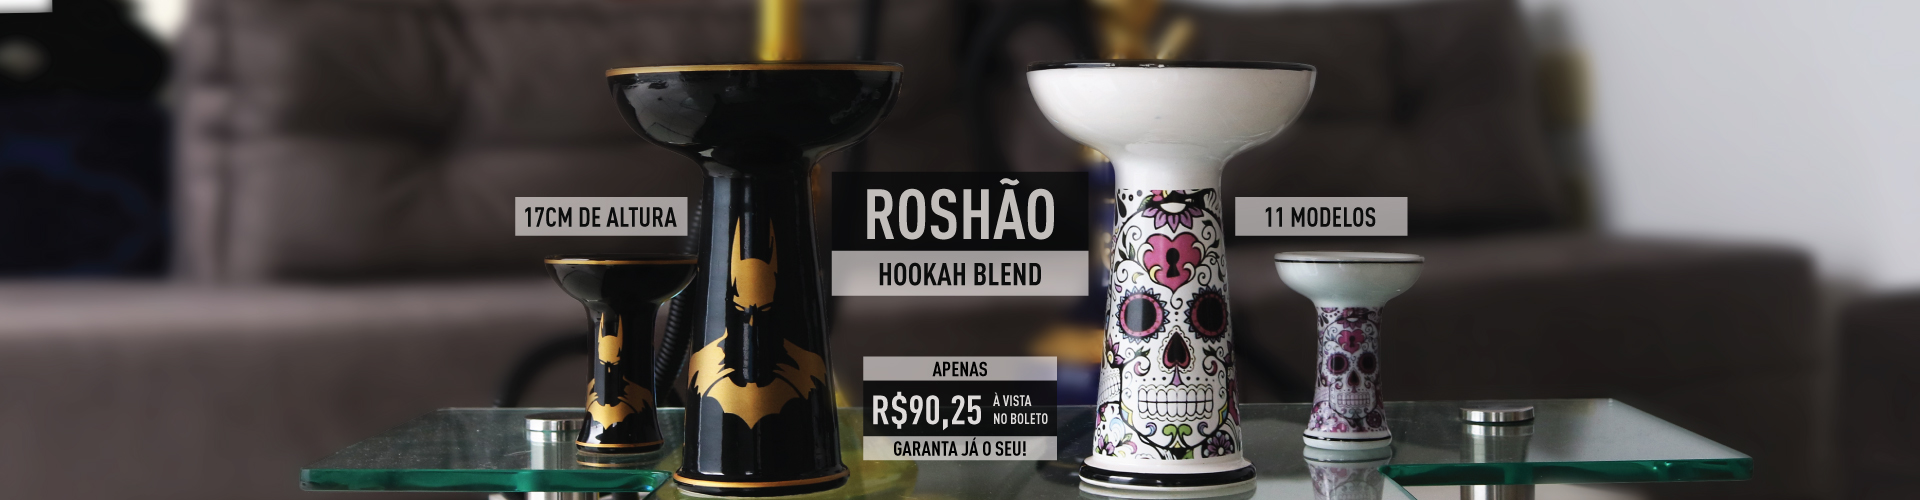 5_MASTER_DESK_HBLEND_ROSHAO